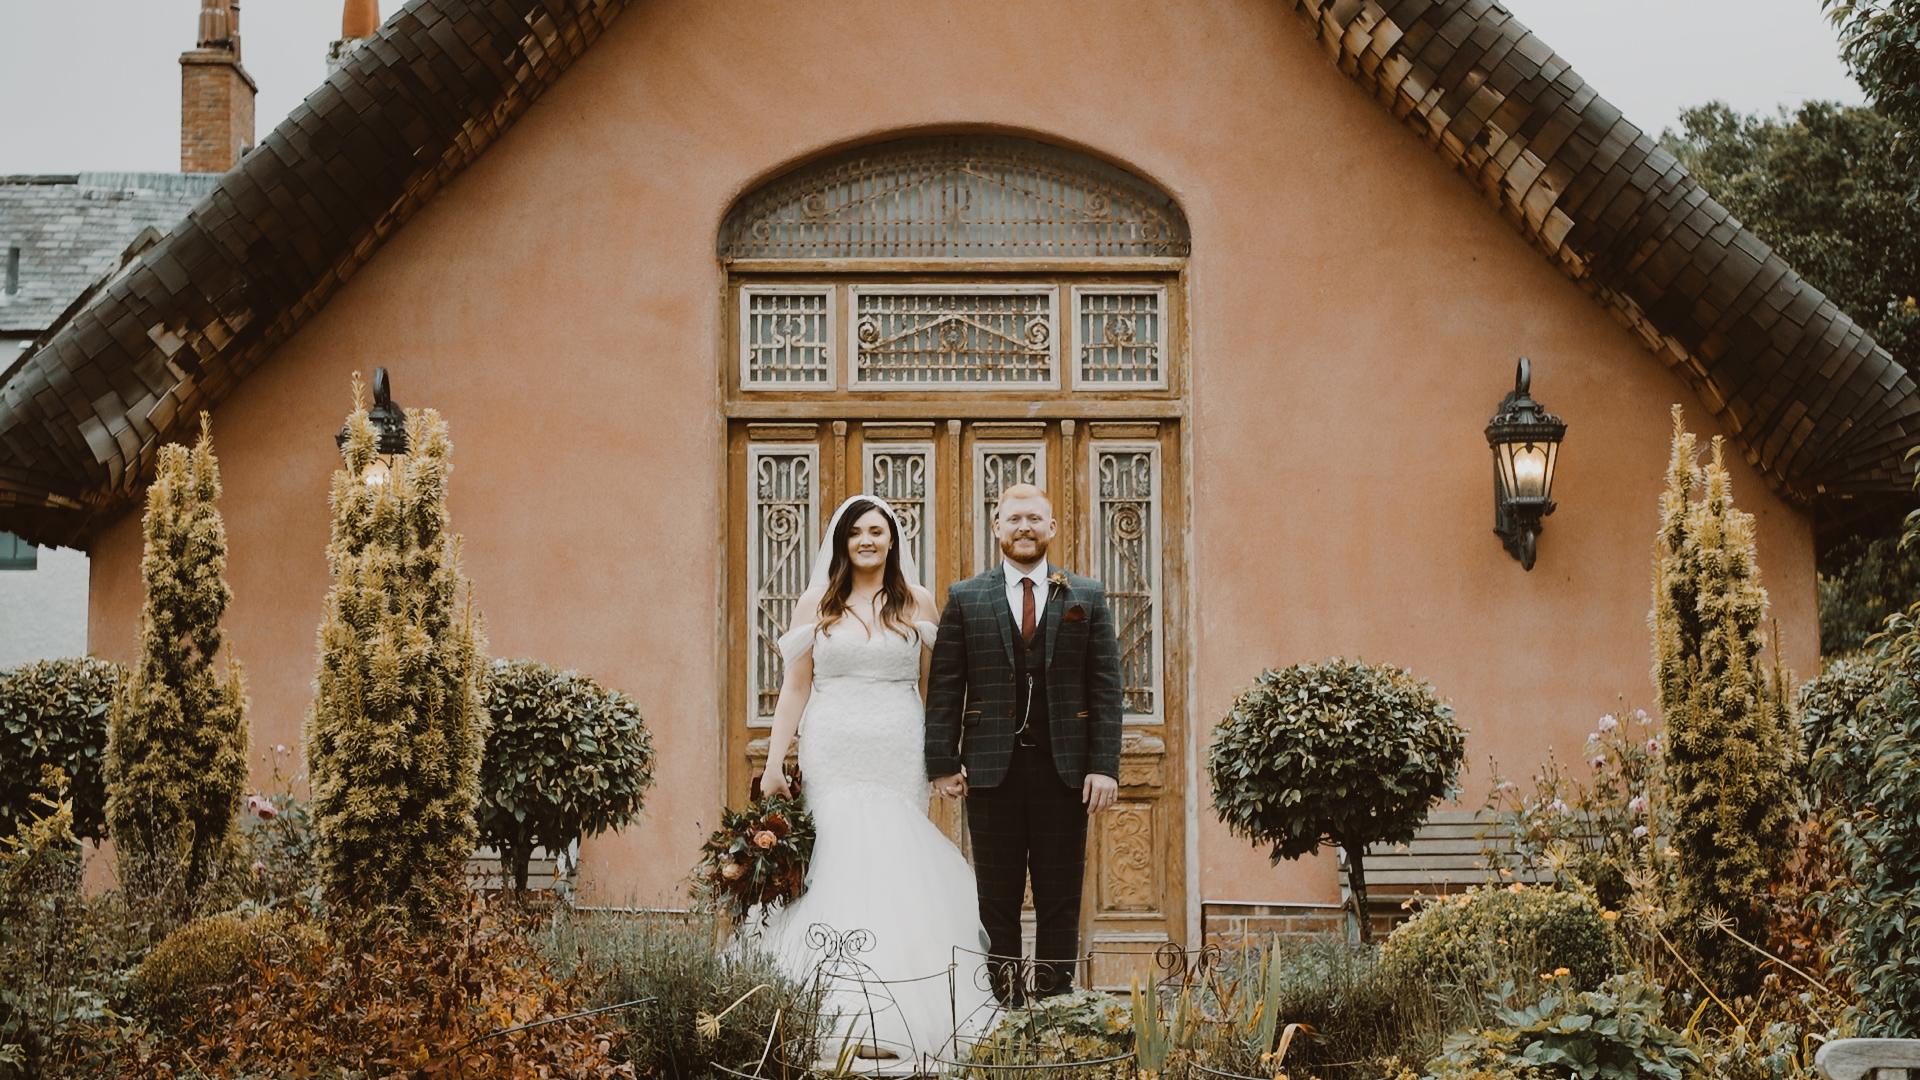 Erin + Kyle | Otterburn, United Kingdom | Le Petit Chateau